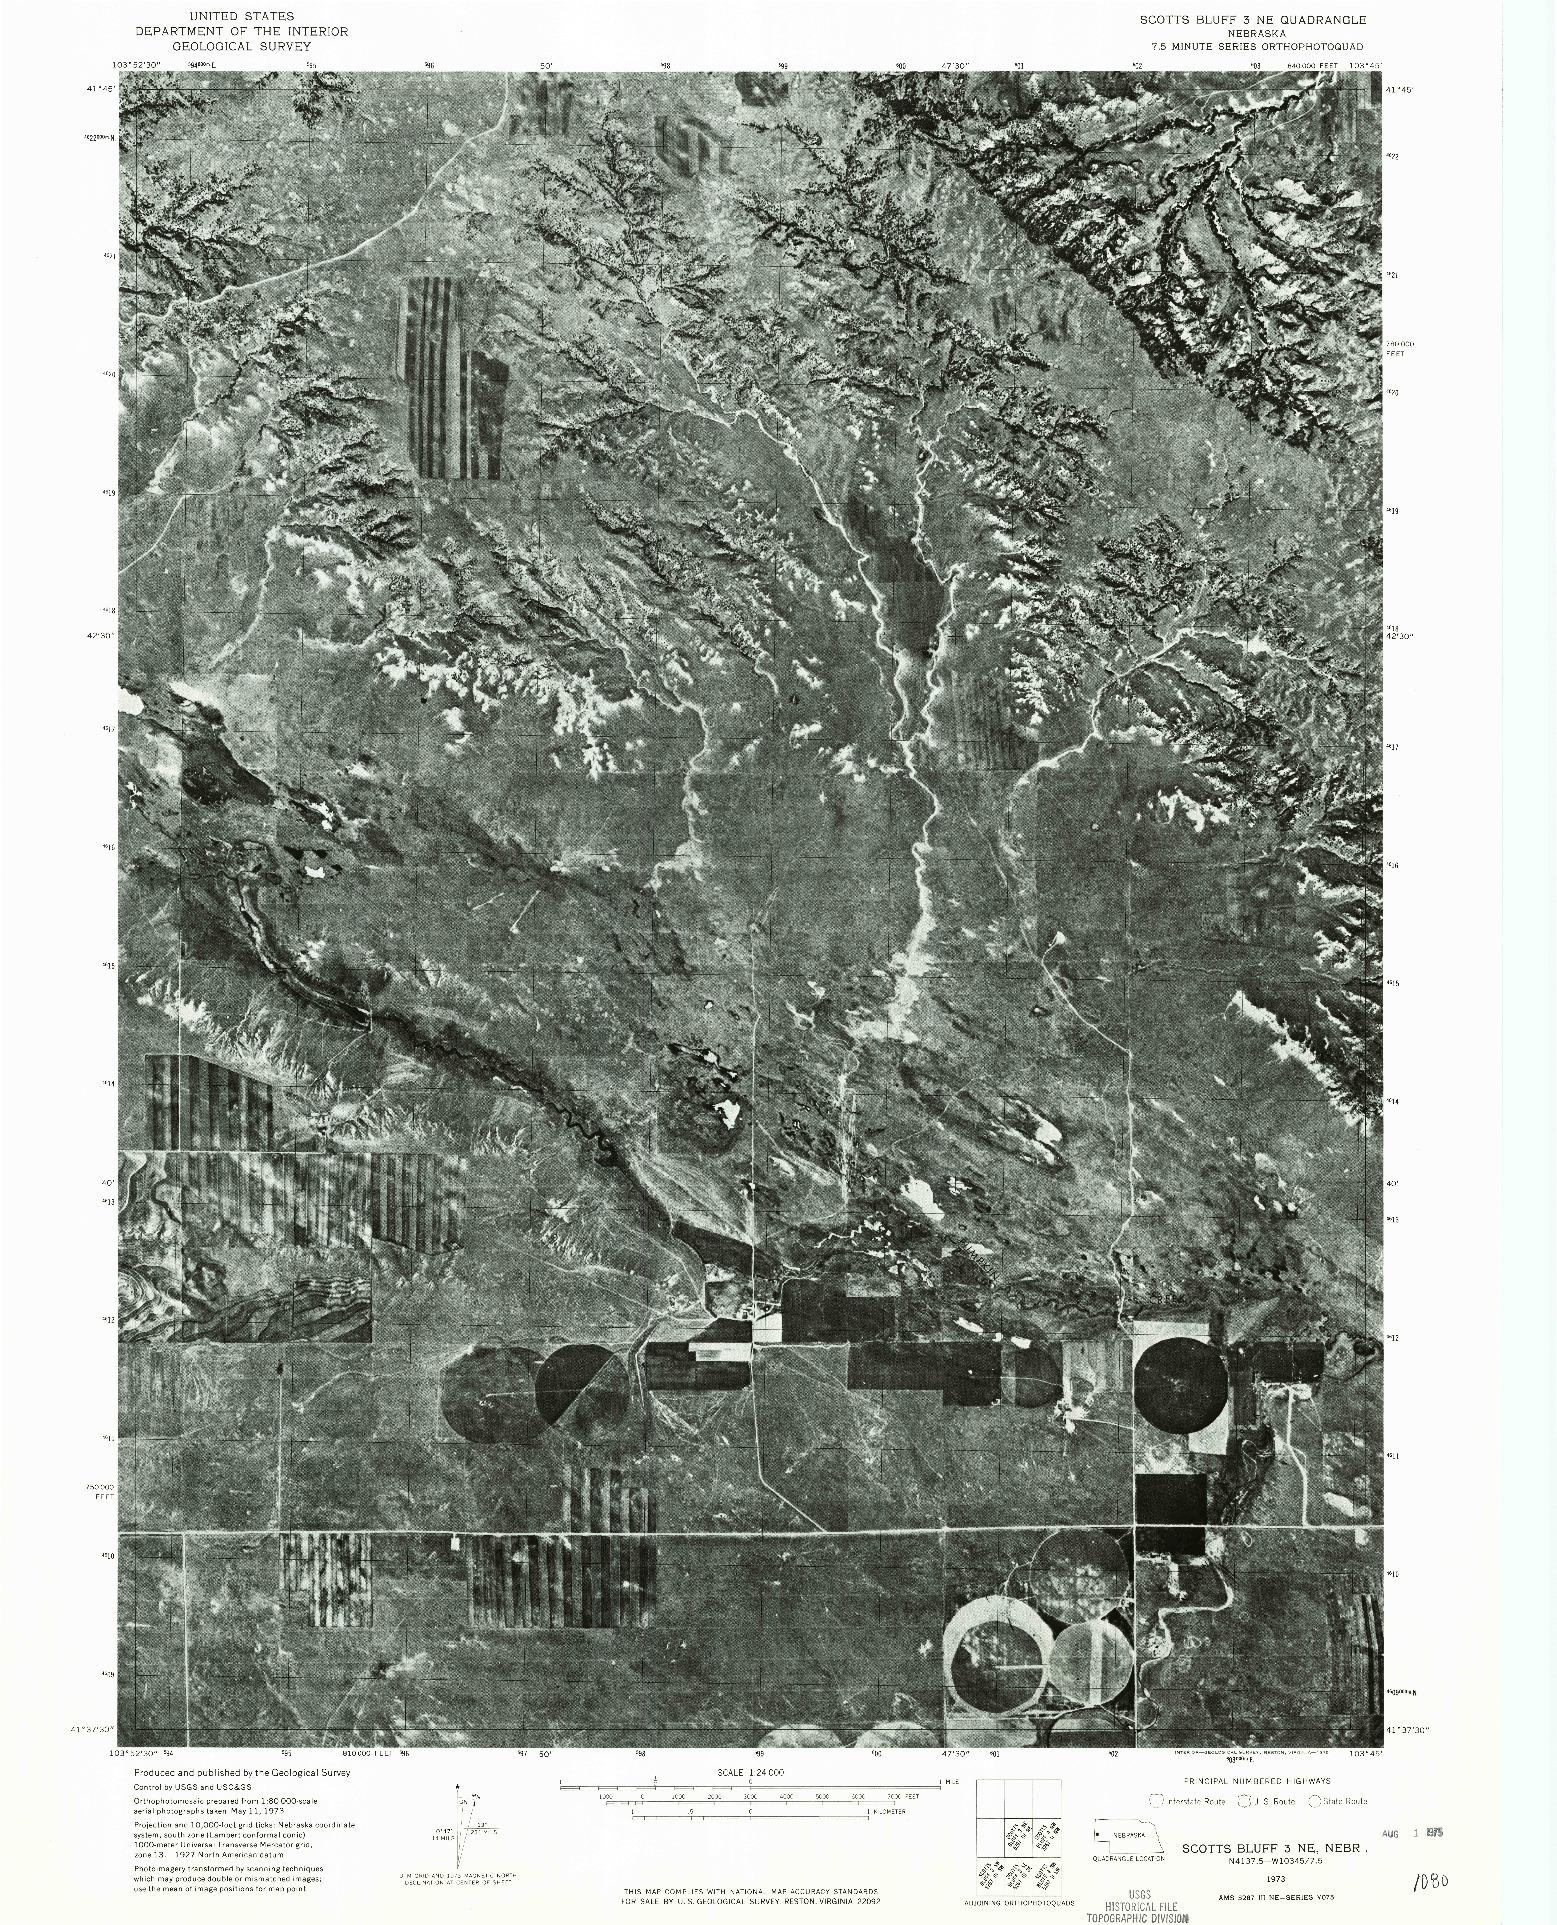 USGS 1:24000-SCALE QUADRANGLE FOR SCOTTS BLUFF 3 NE, NE 1973